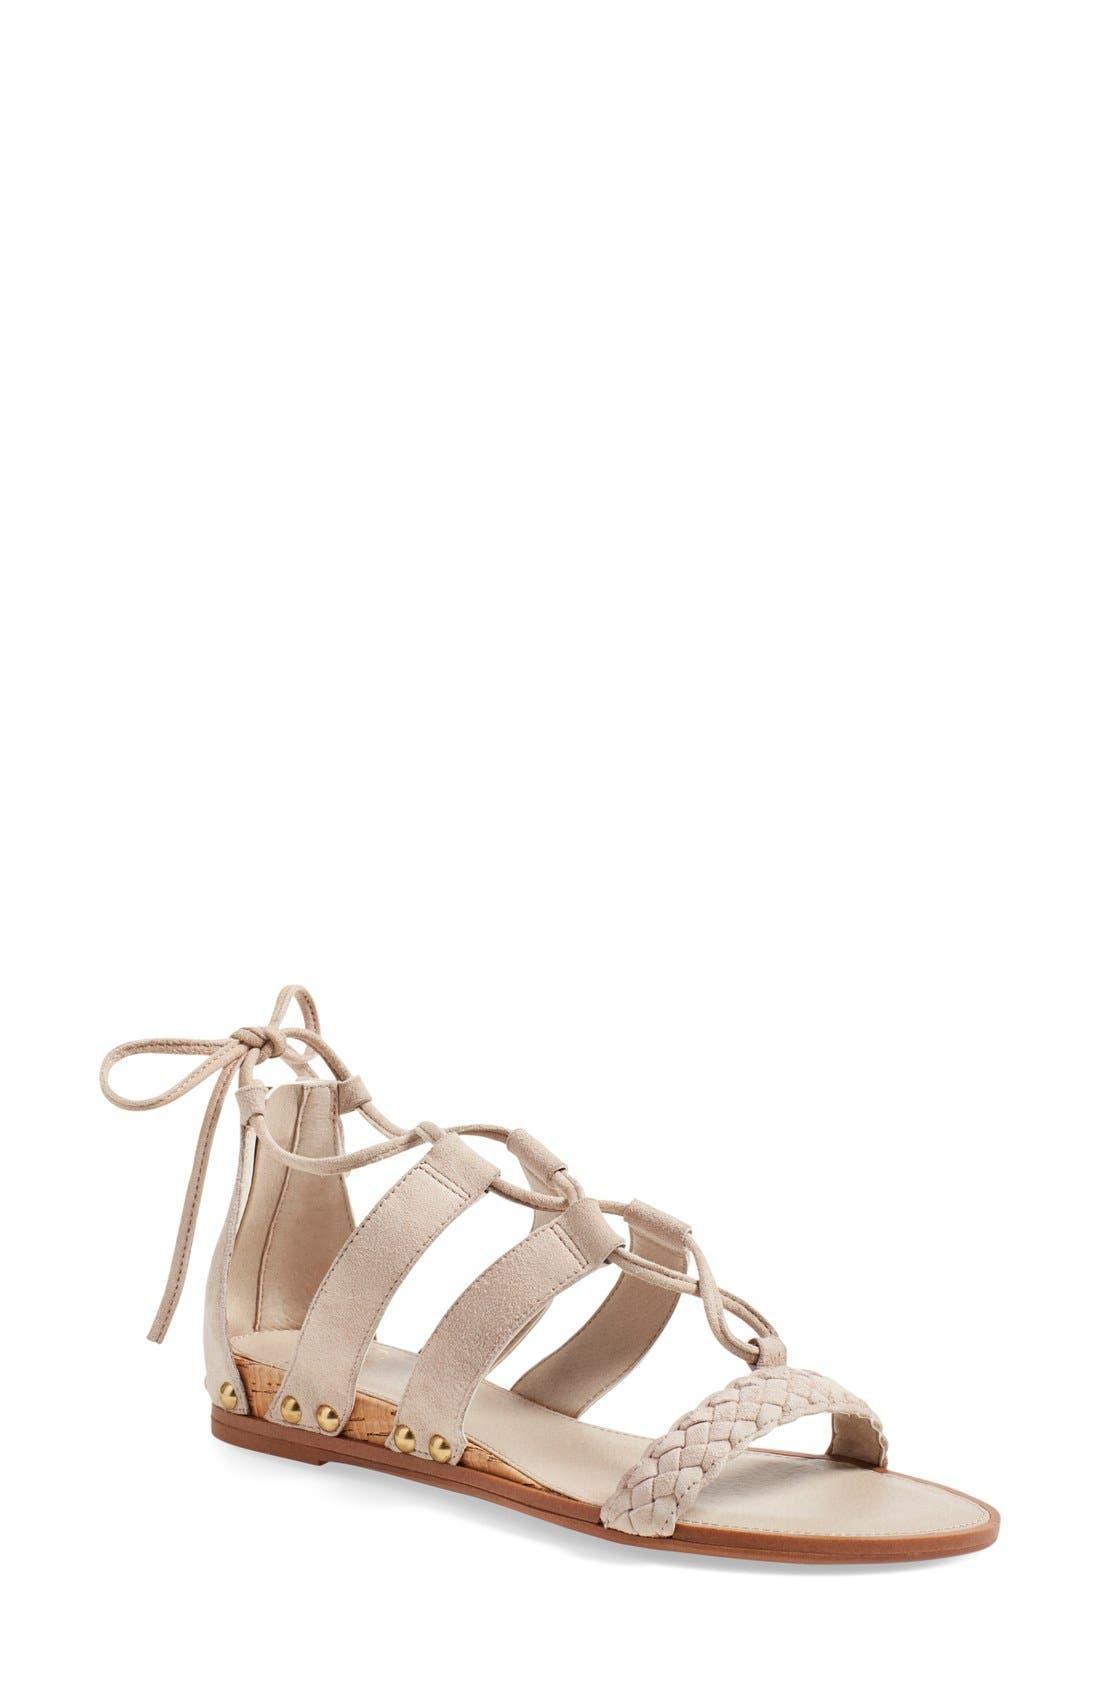 Main Image - SARTO by Franco Sarto 'Pierson' Lace-Up Sandal (Women)